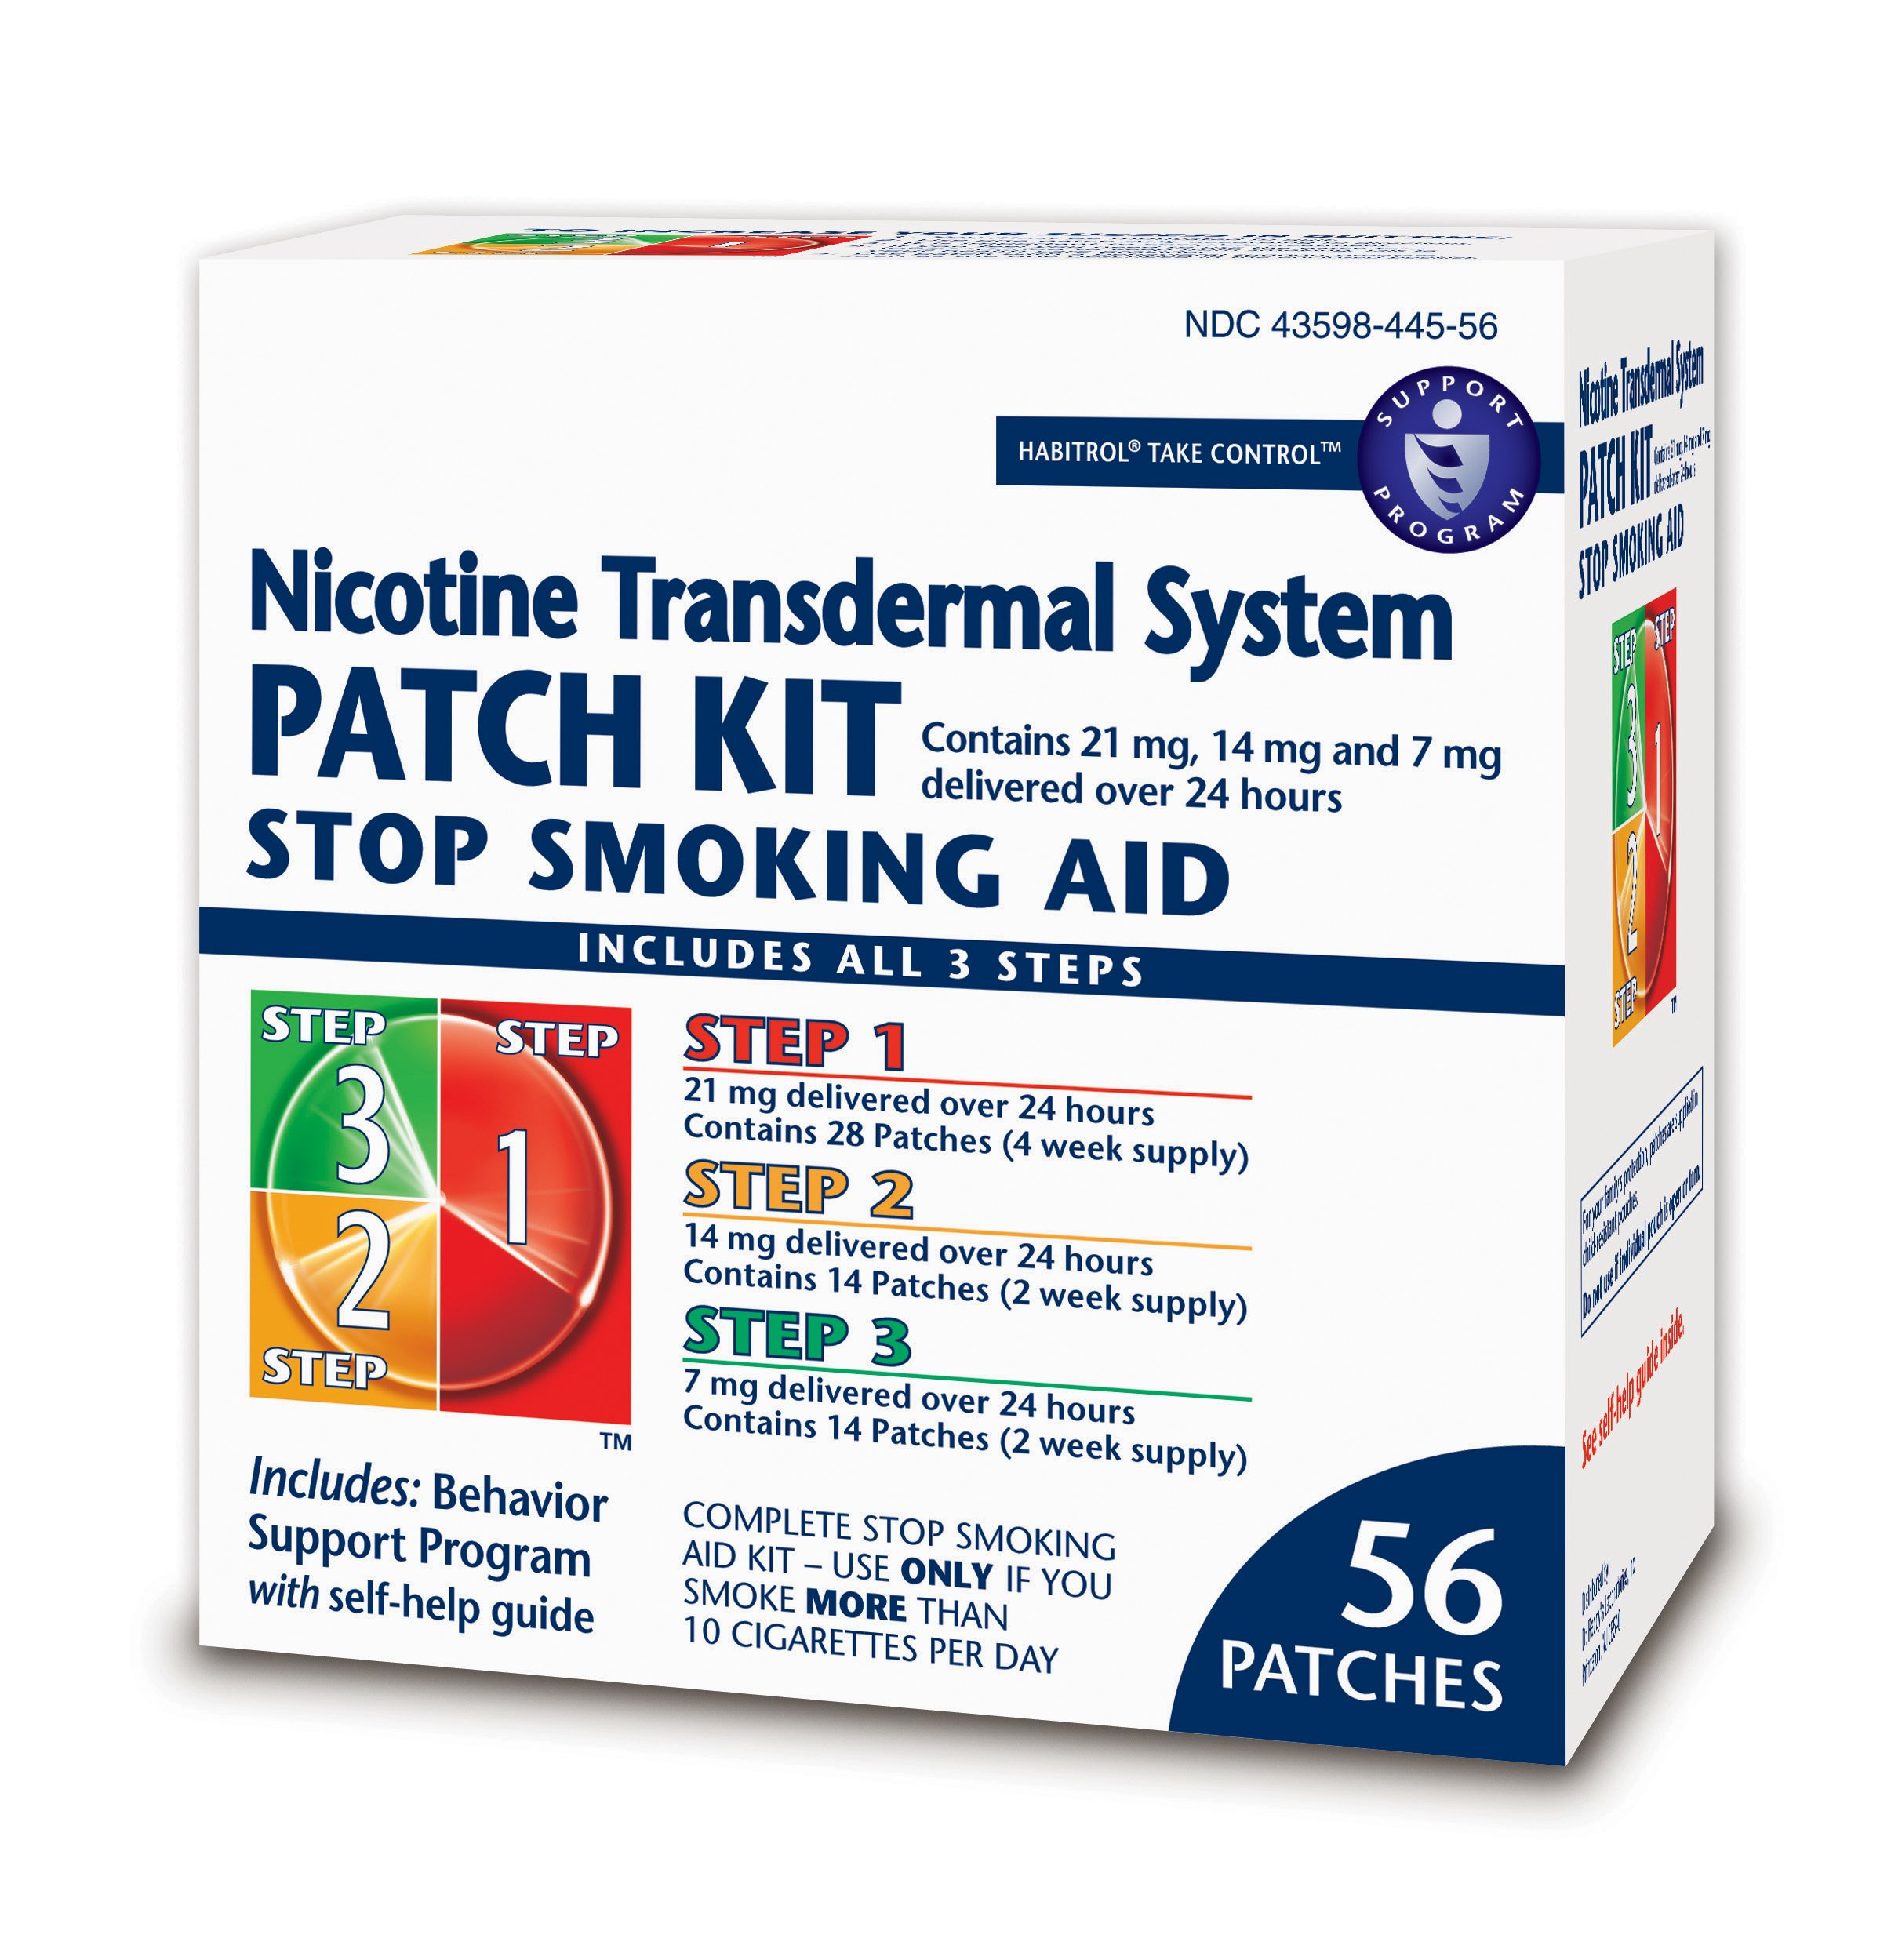 Habitrol Nicotine Transdermal System Stop Smoking Aid Kit; Steps 1,2,3; 56 Patches